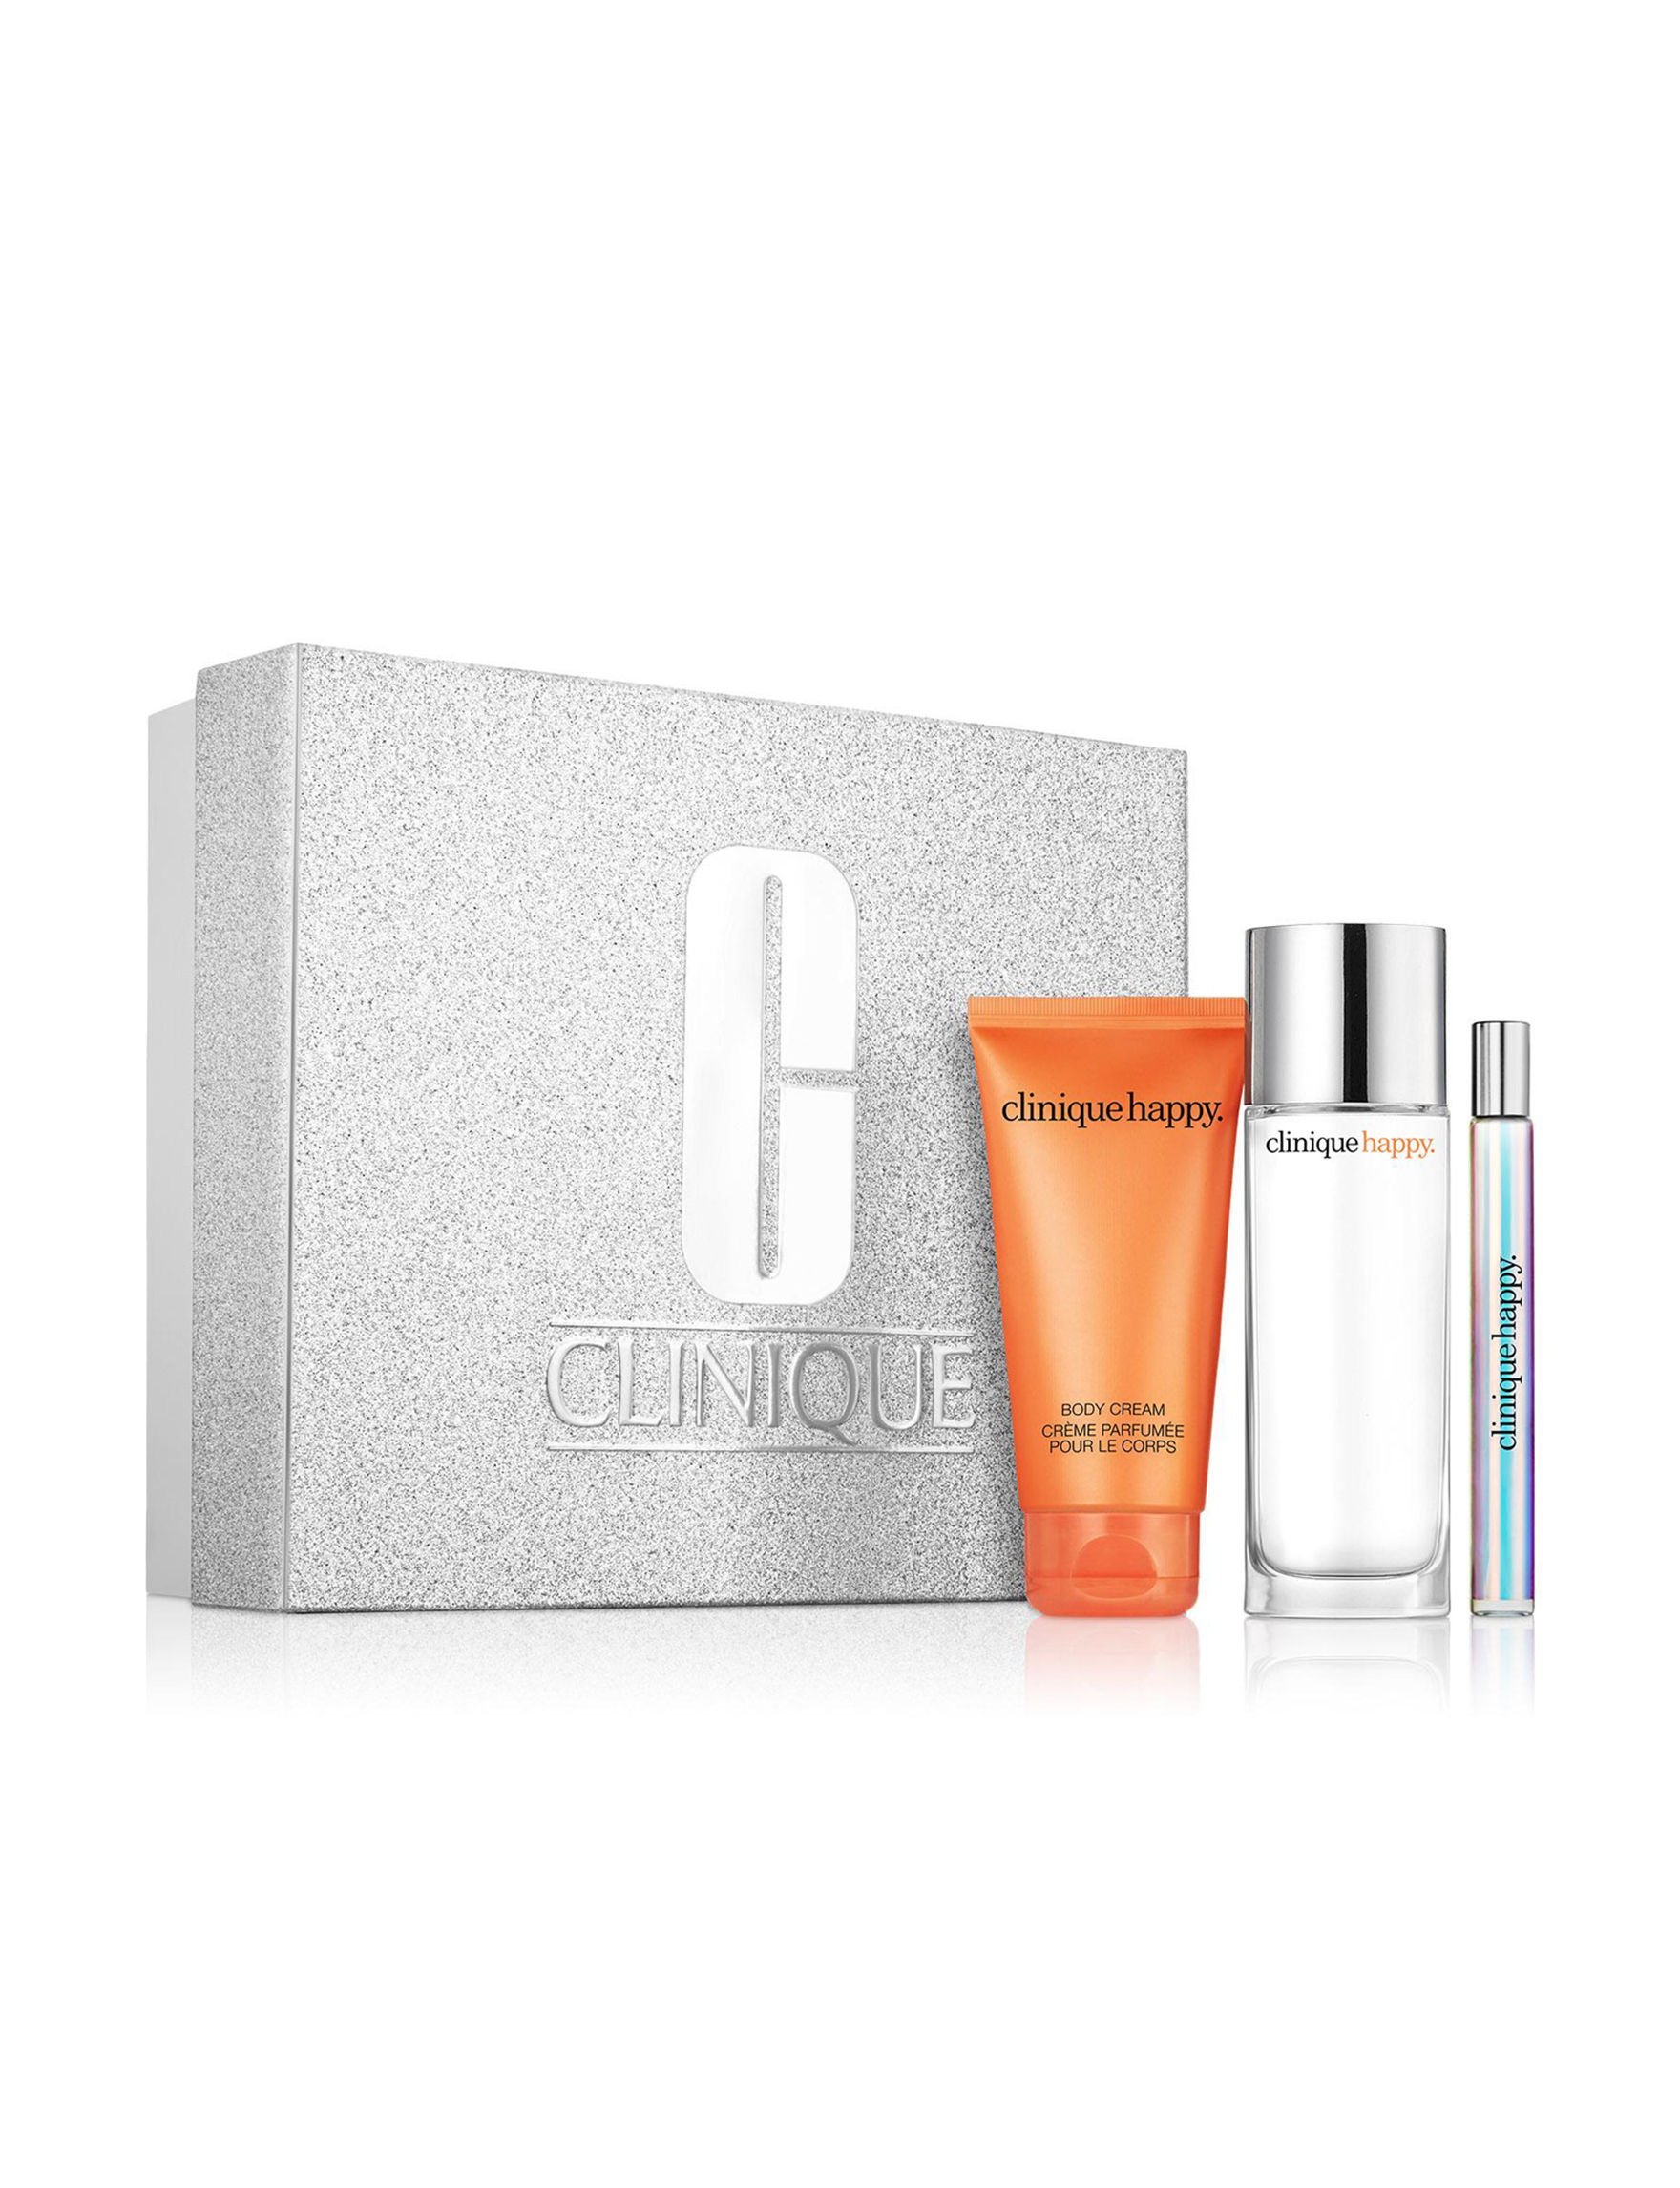 Clinique  Fragrance Gift Sets